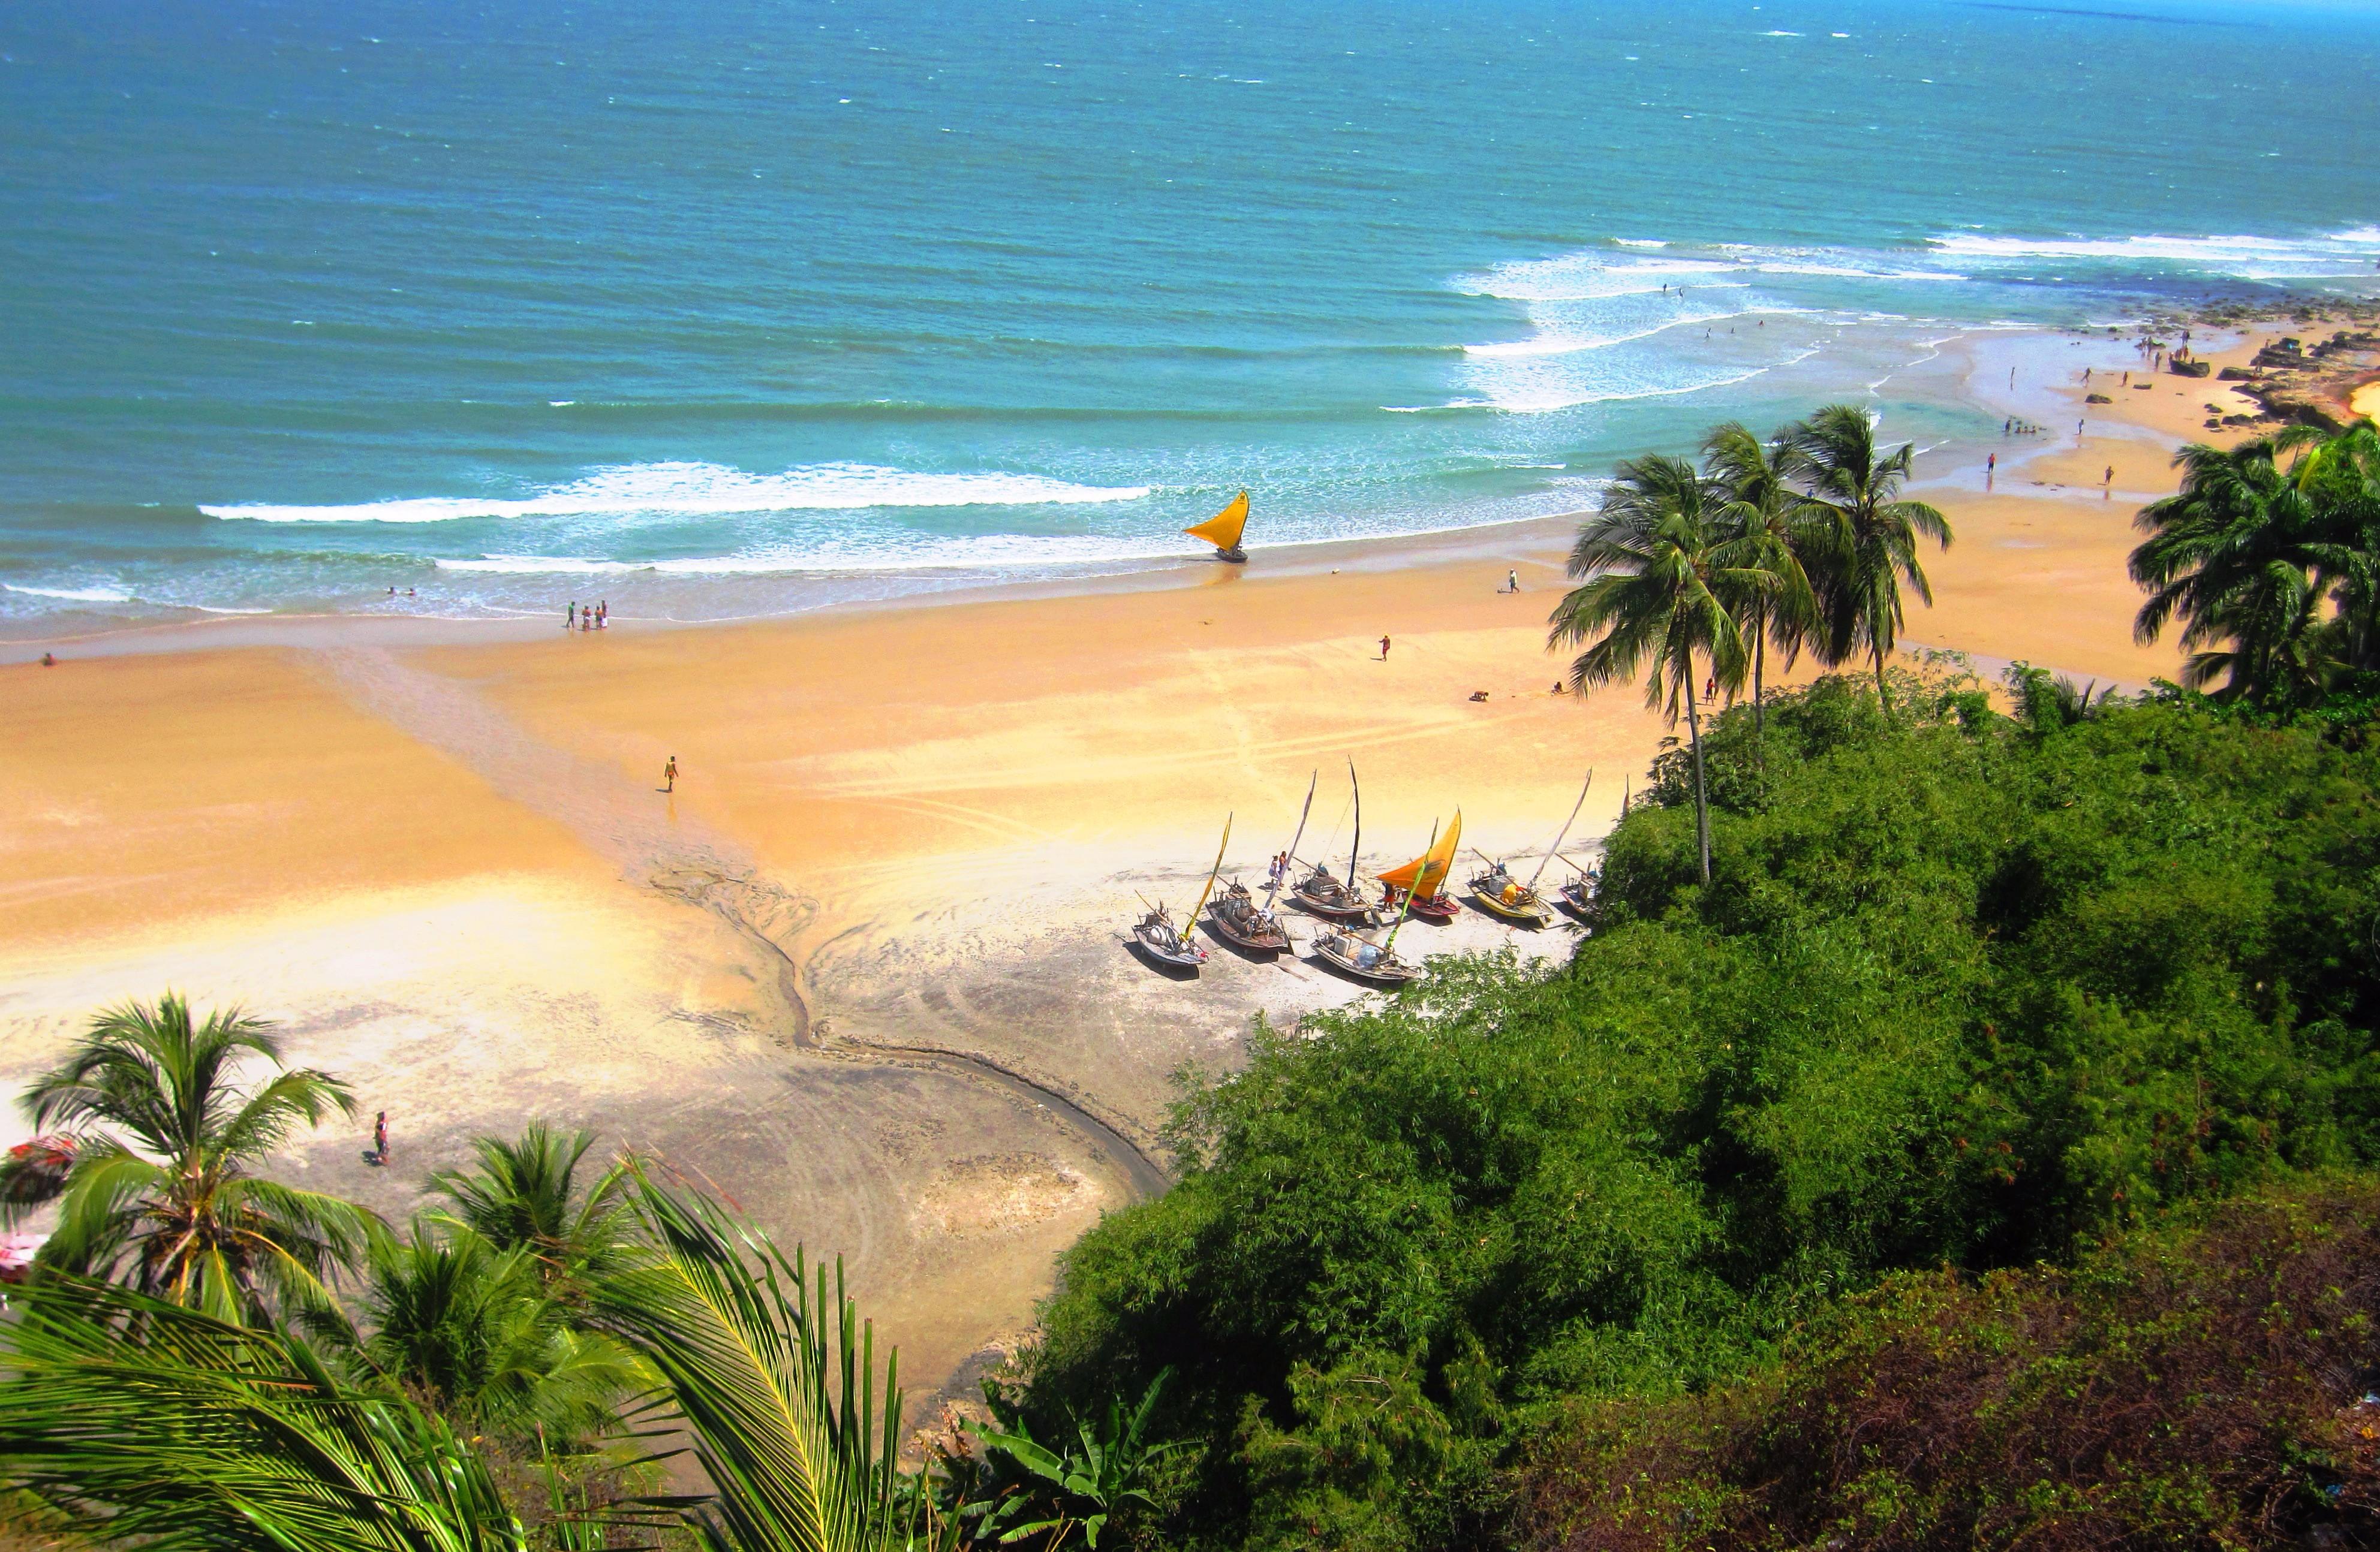 Beauties of Lagoinha